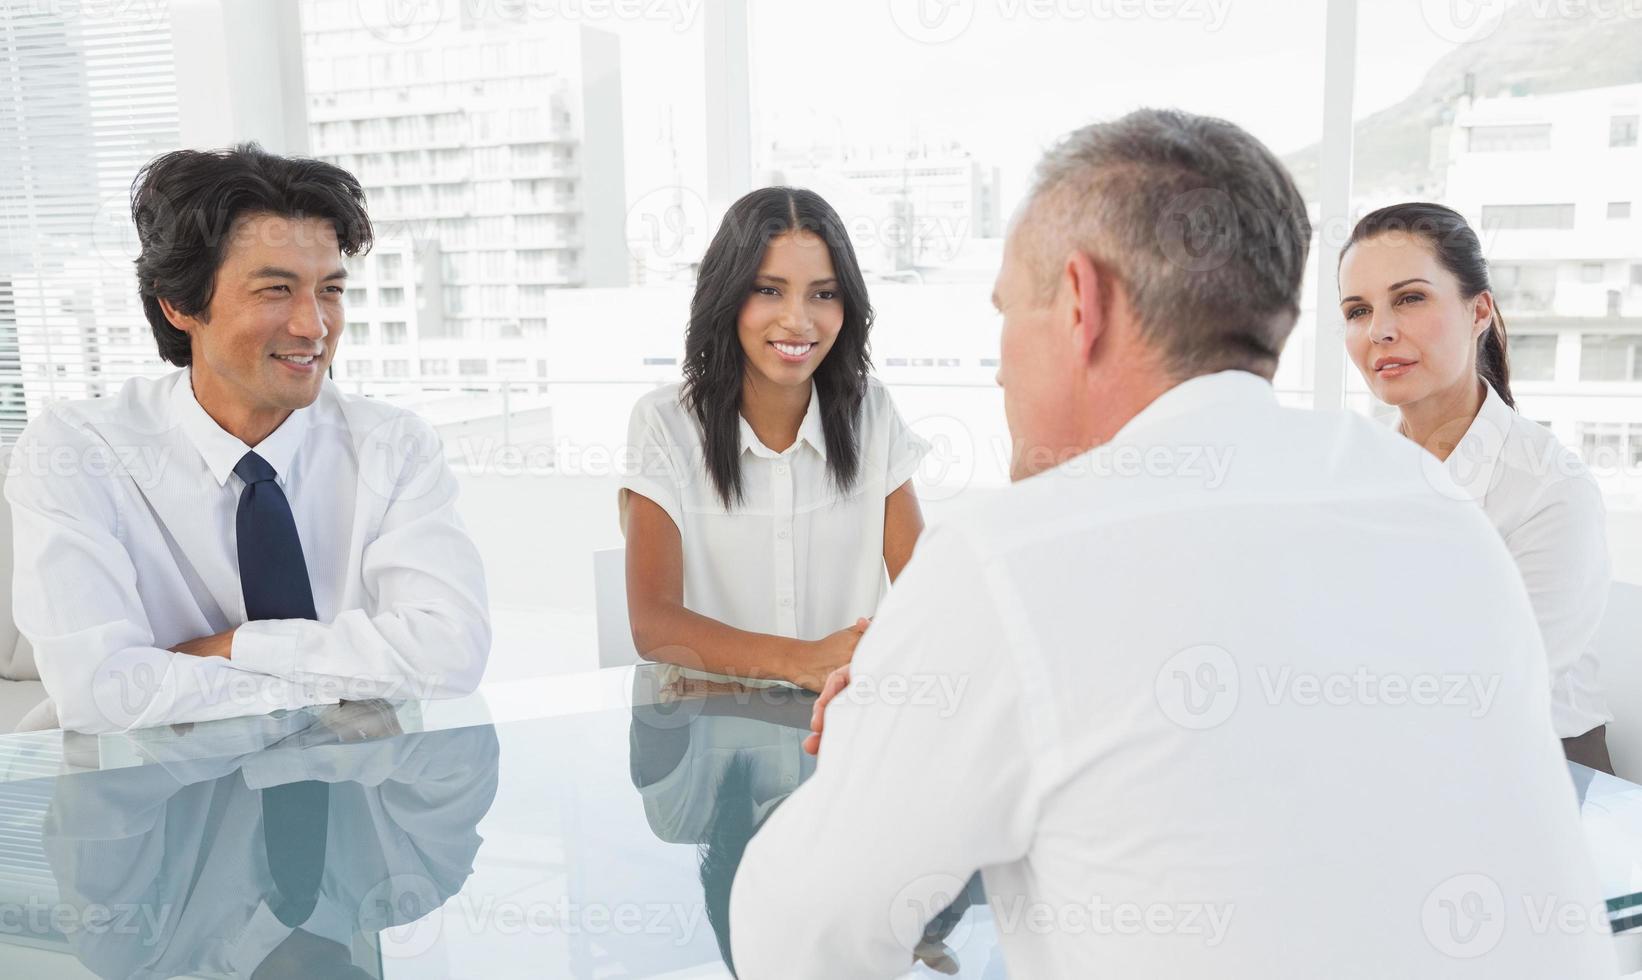 equipe de negócios feliz falando juntos foto